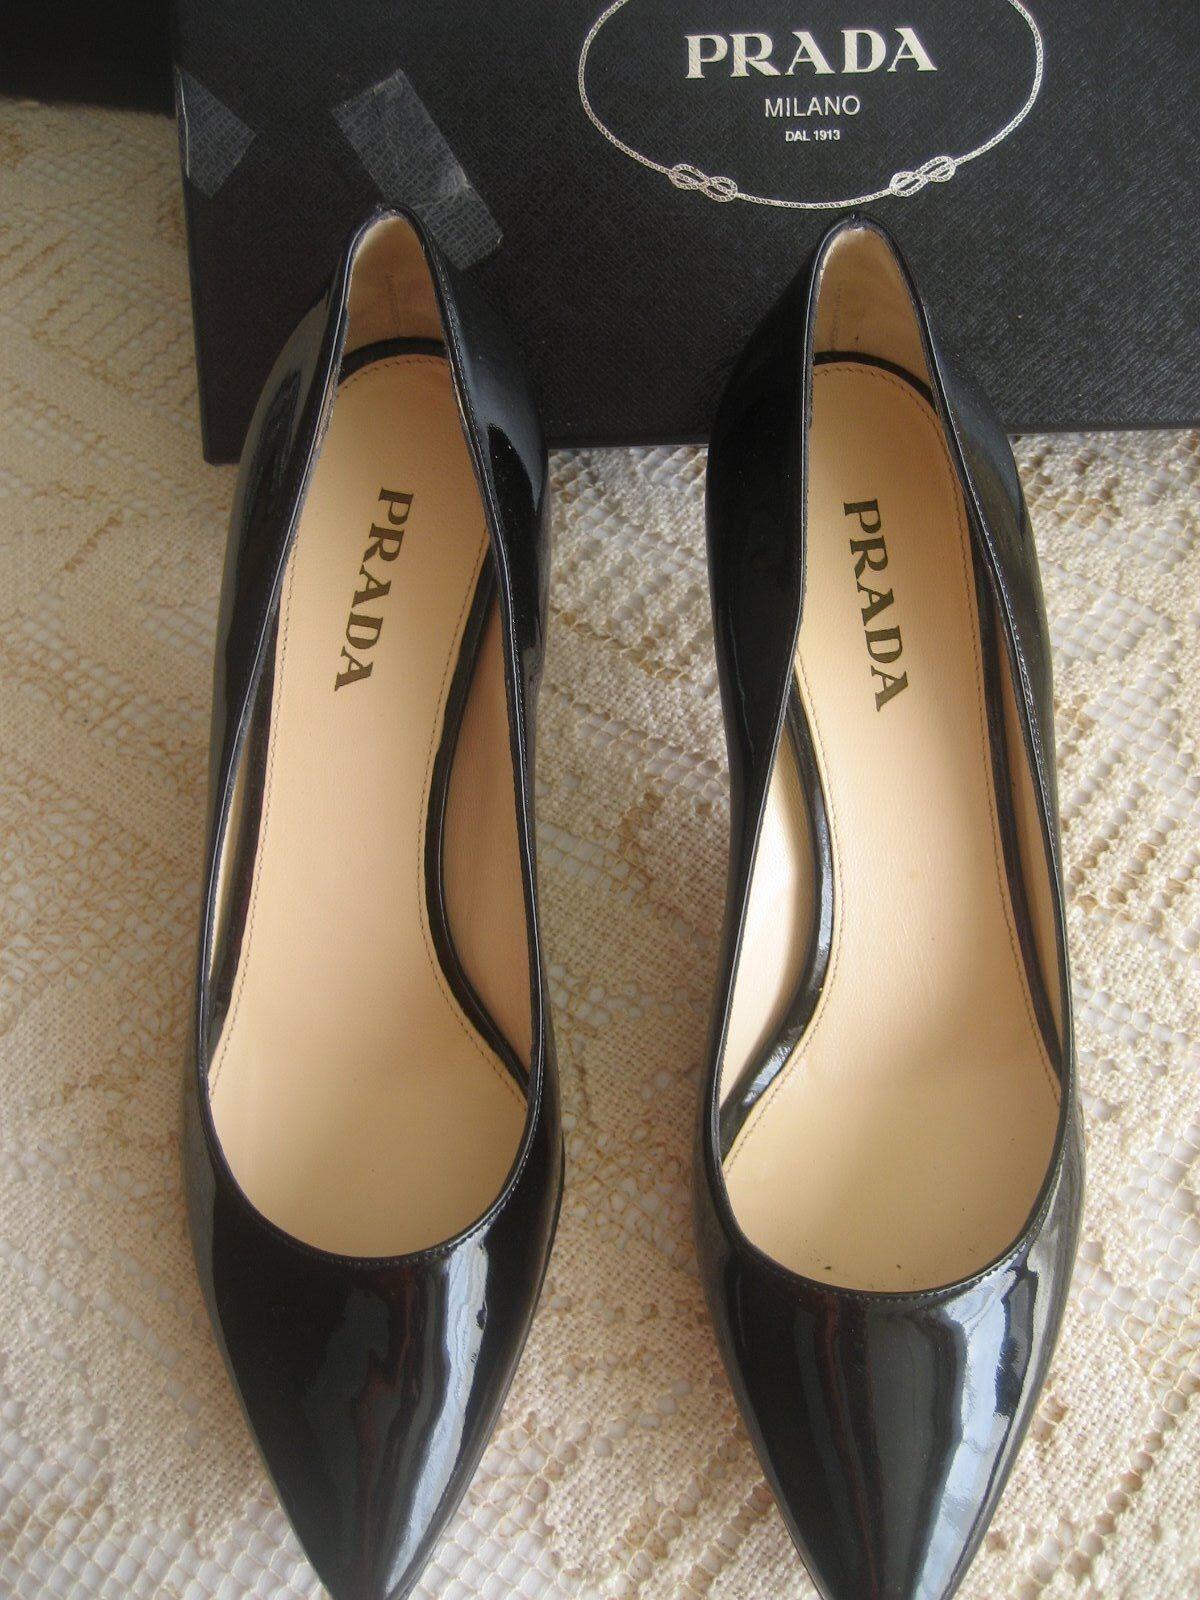 PRADA Classic Black Patent Leather 3  Heels Sz 39 New in Box